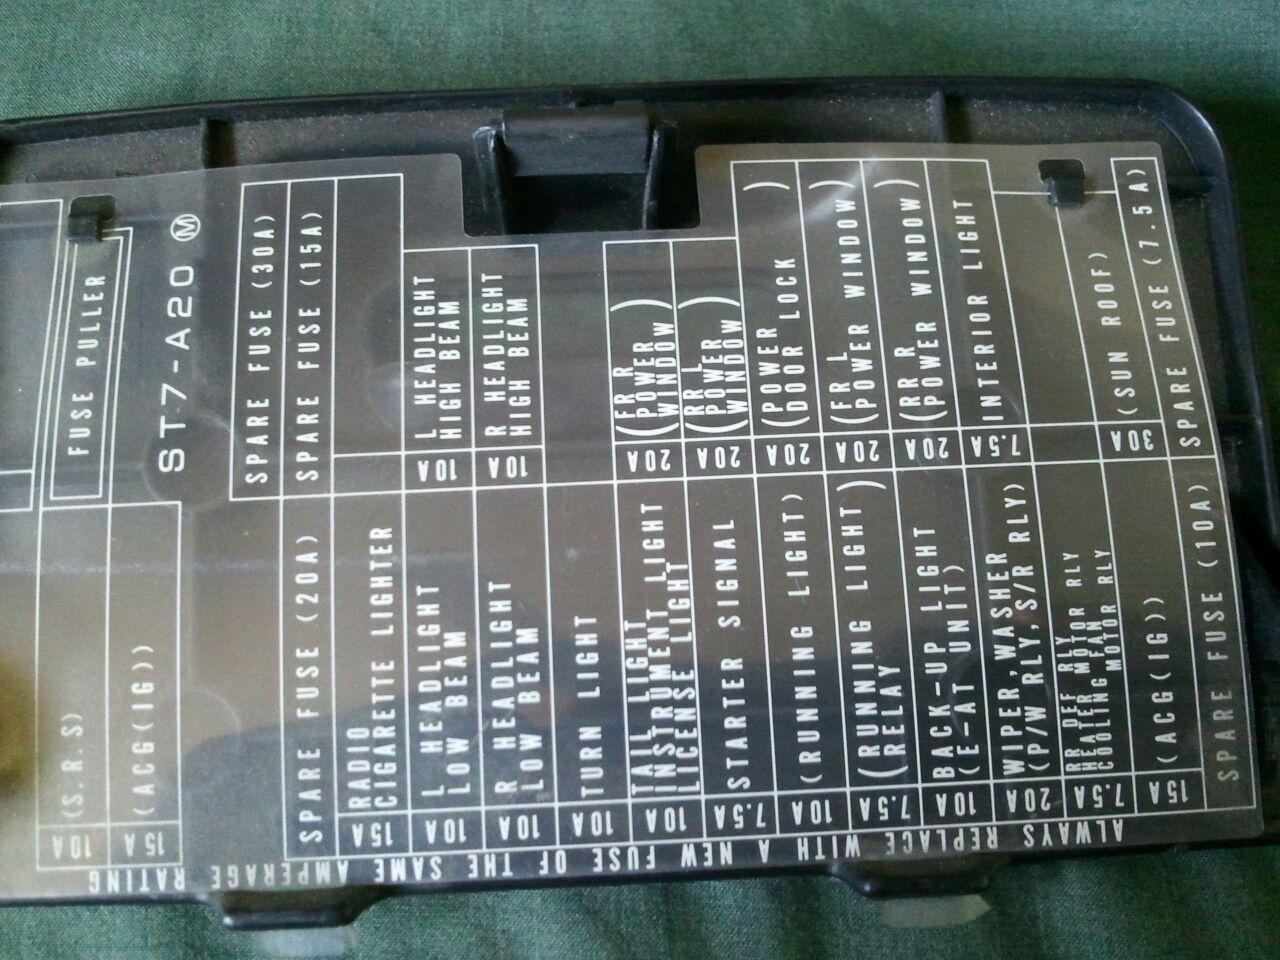 95 Acura Integra Fuse Box Diagram Auto Electrical Wiring Honda Del Sol 97